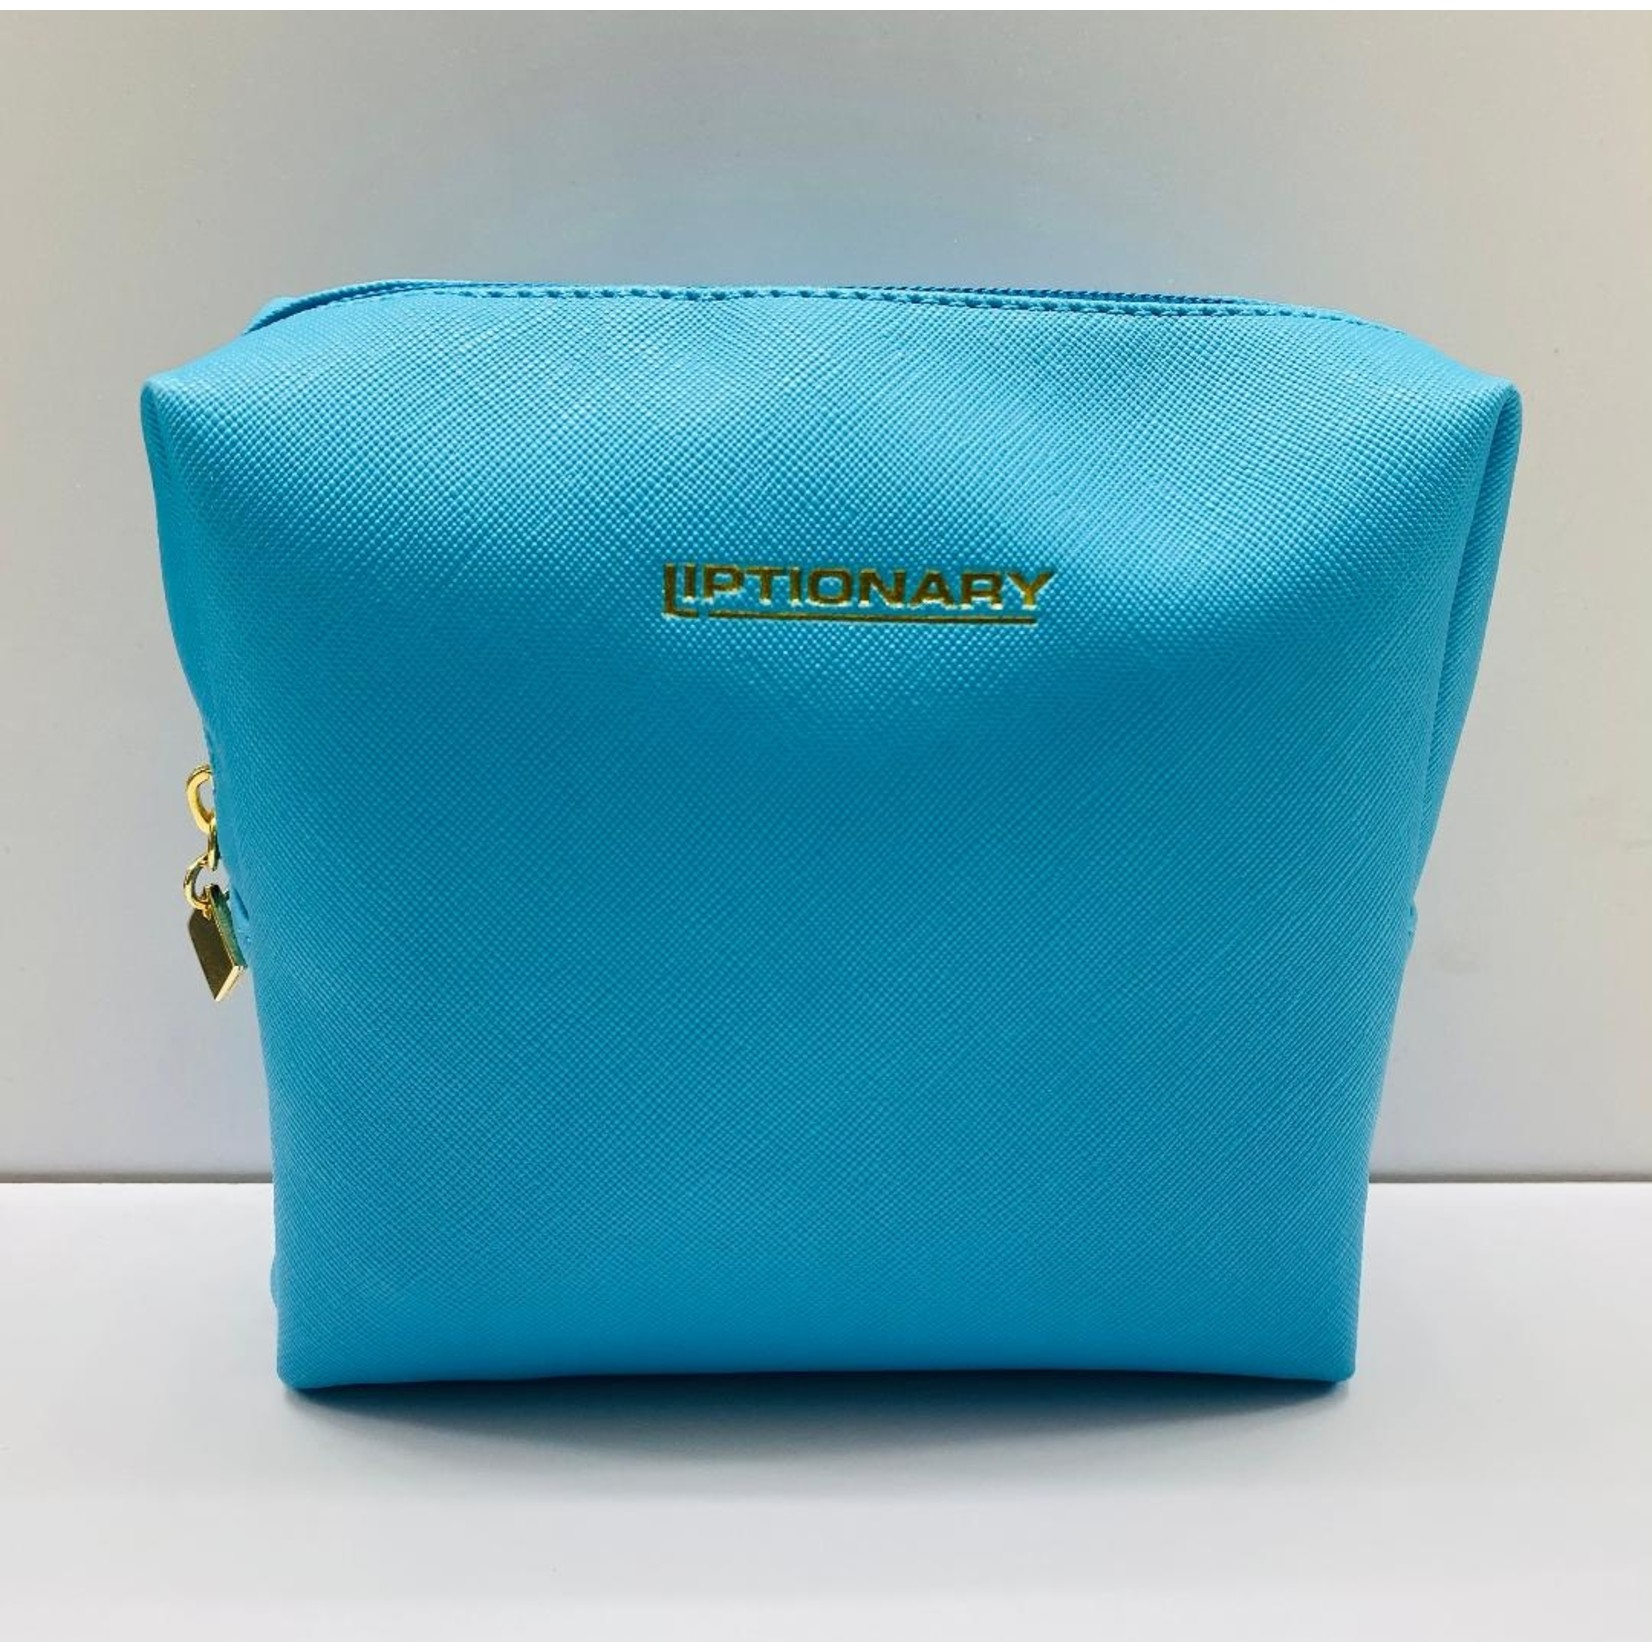 Vegan Leather Lip Bag - Turquoise